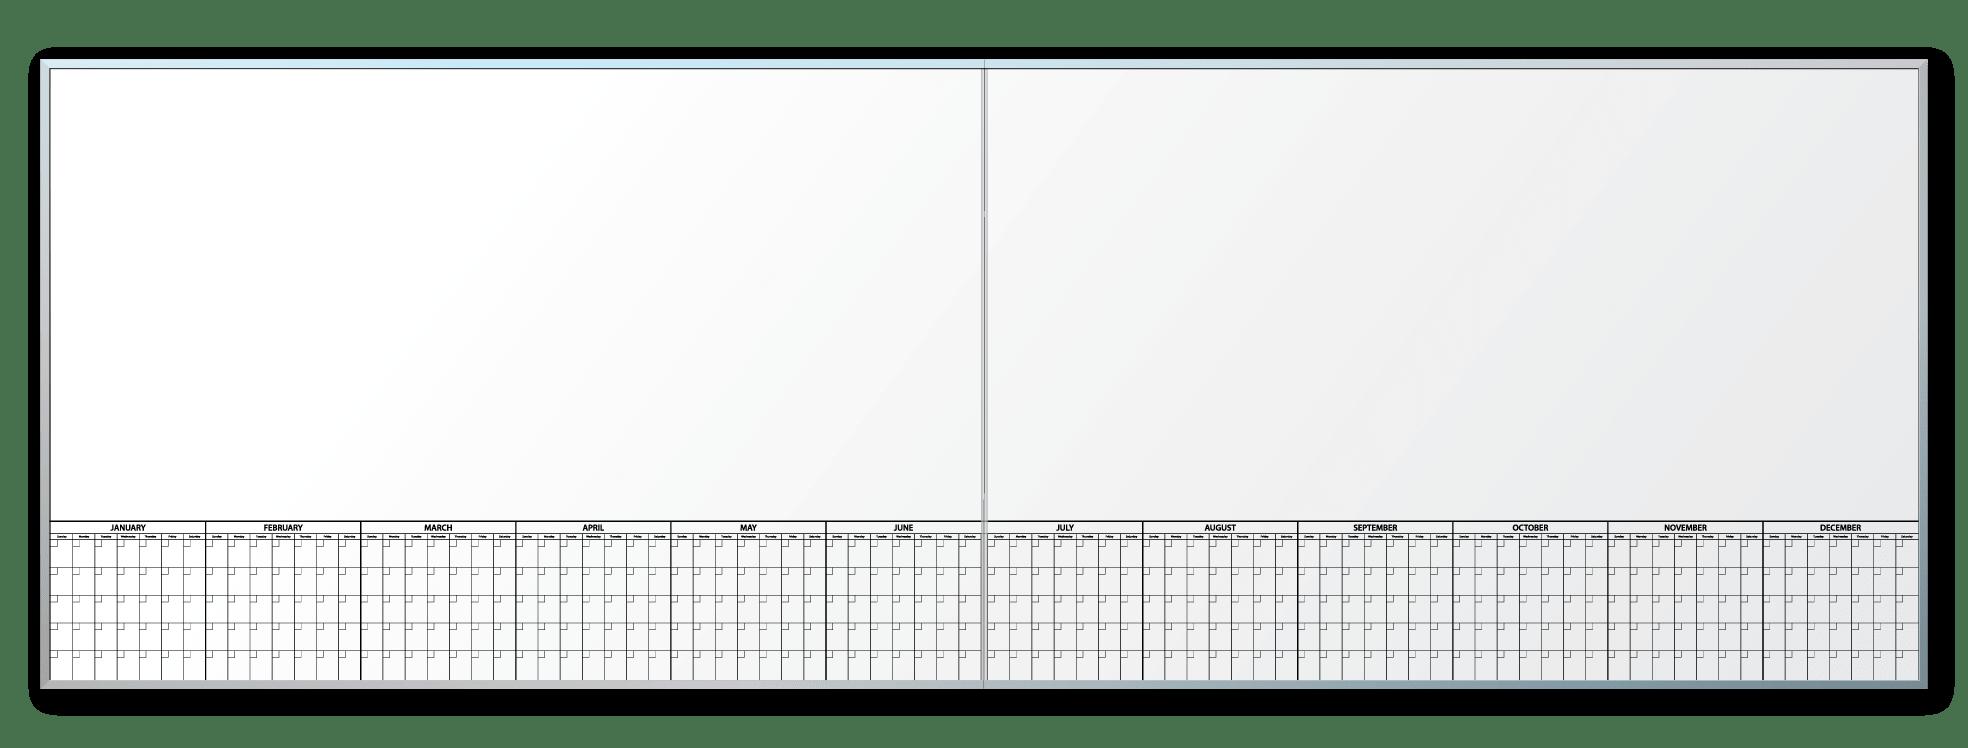 Robert Longo Studios Oversized Calender Dry Erase Board